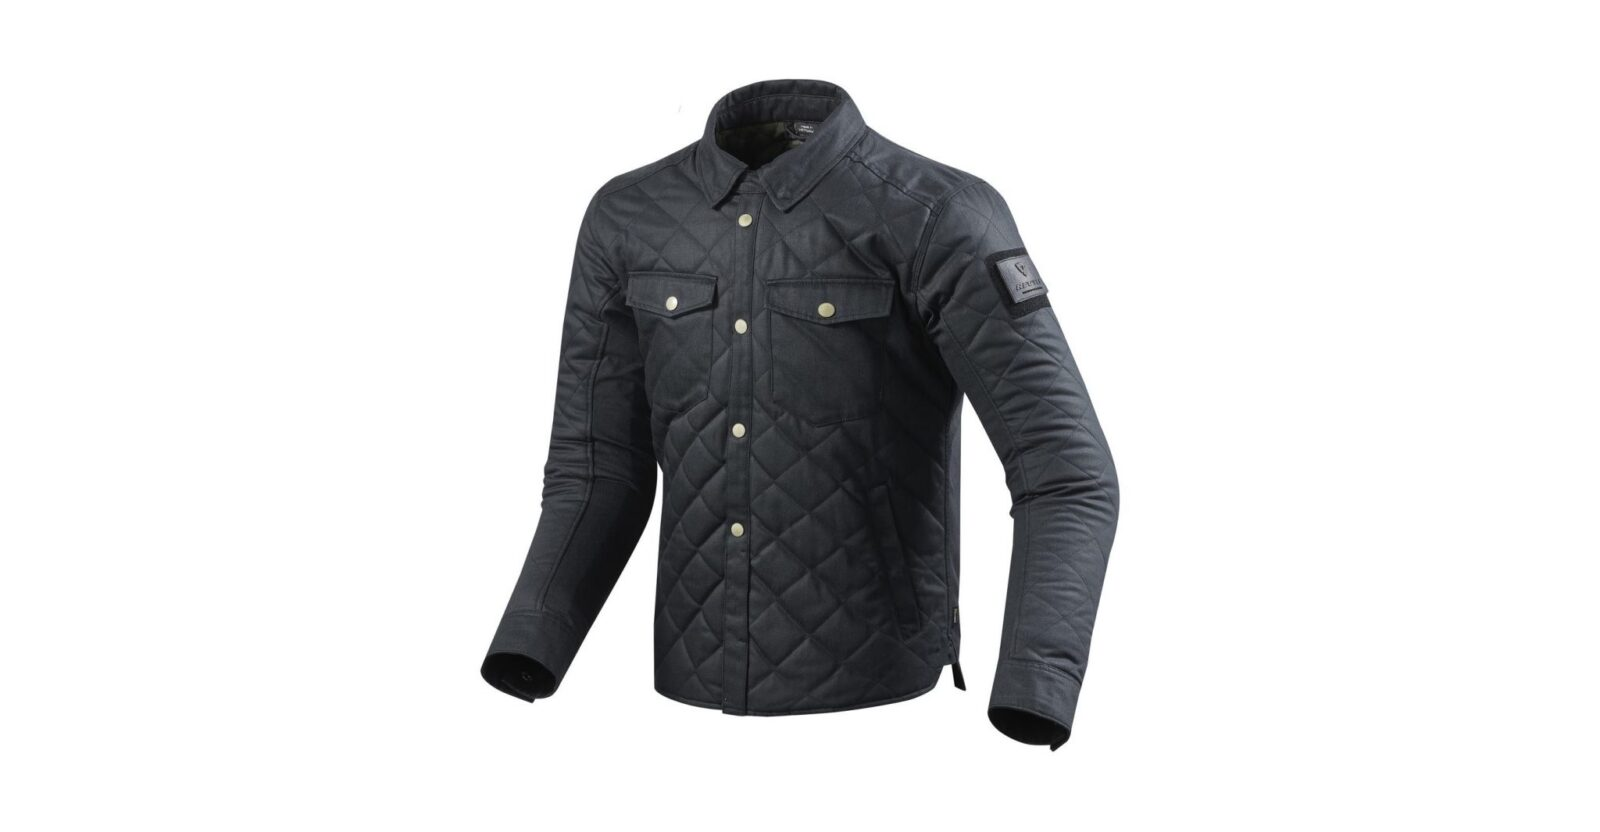 REVIT Westport Overshirt 1600x832 - REV'IT! Westport Armored Overshirt